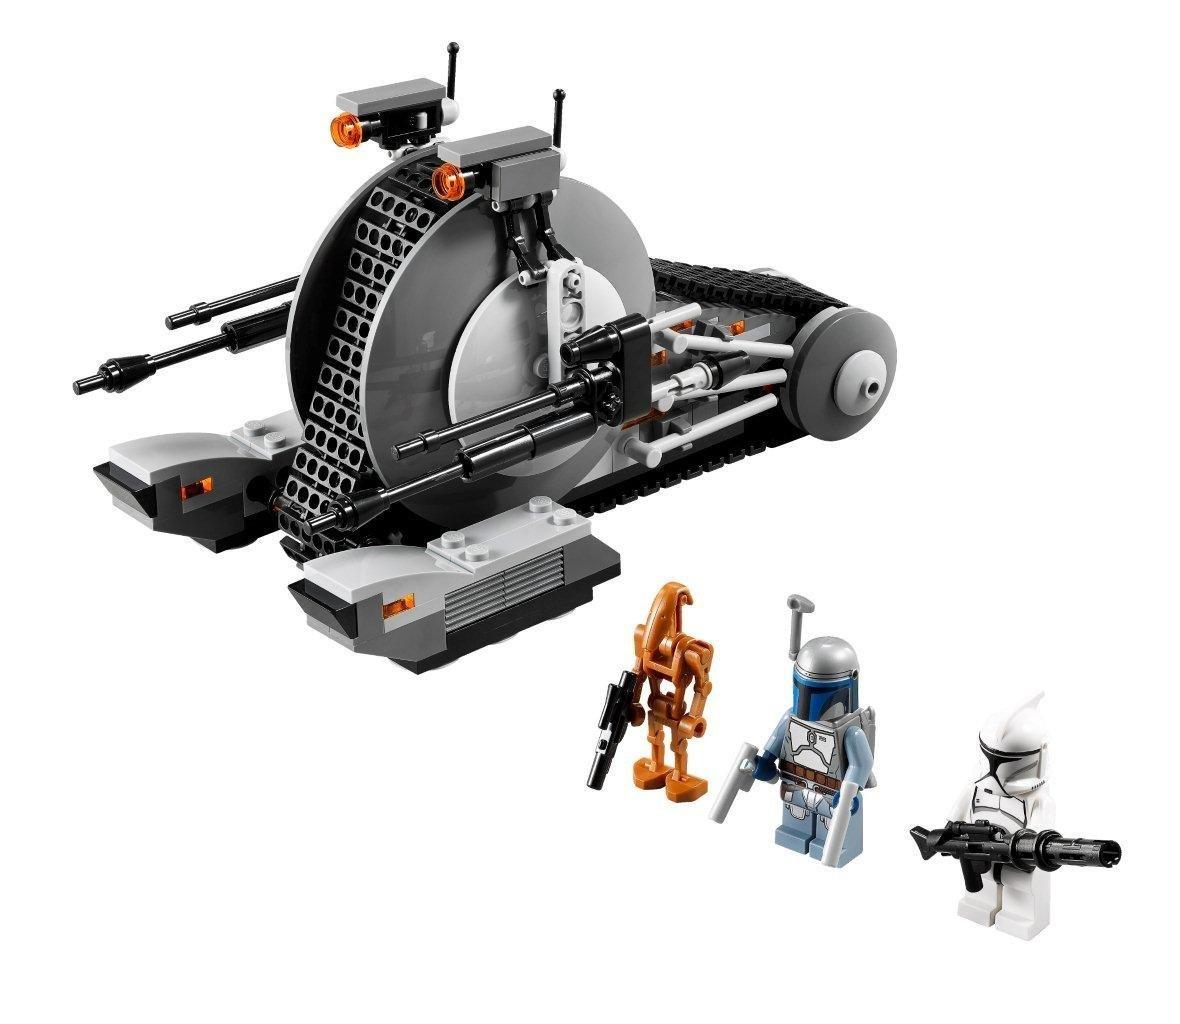 LEGO Star Wars 75015 - Corporate Alliance Tank Droid